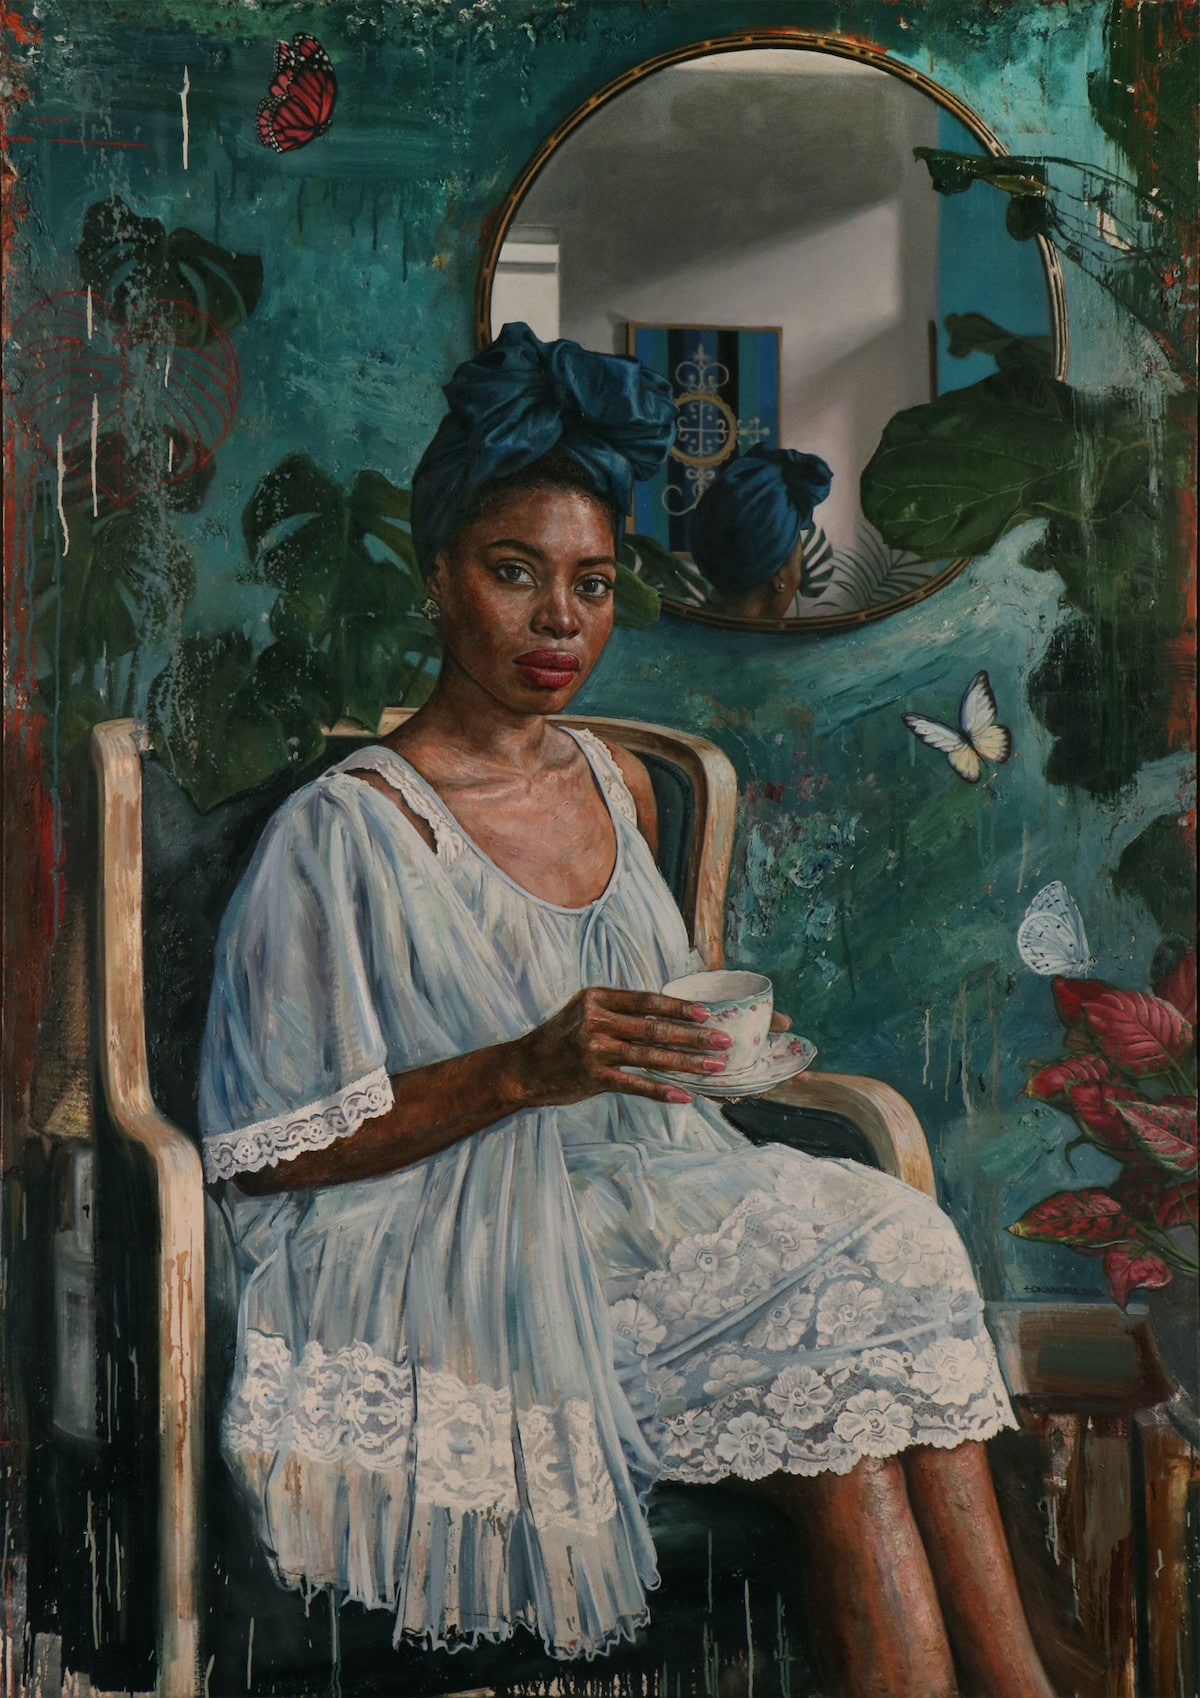 Portrait Painting by Tim Okamura